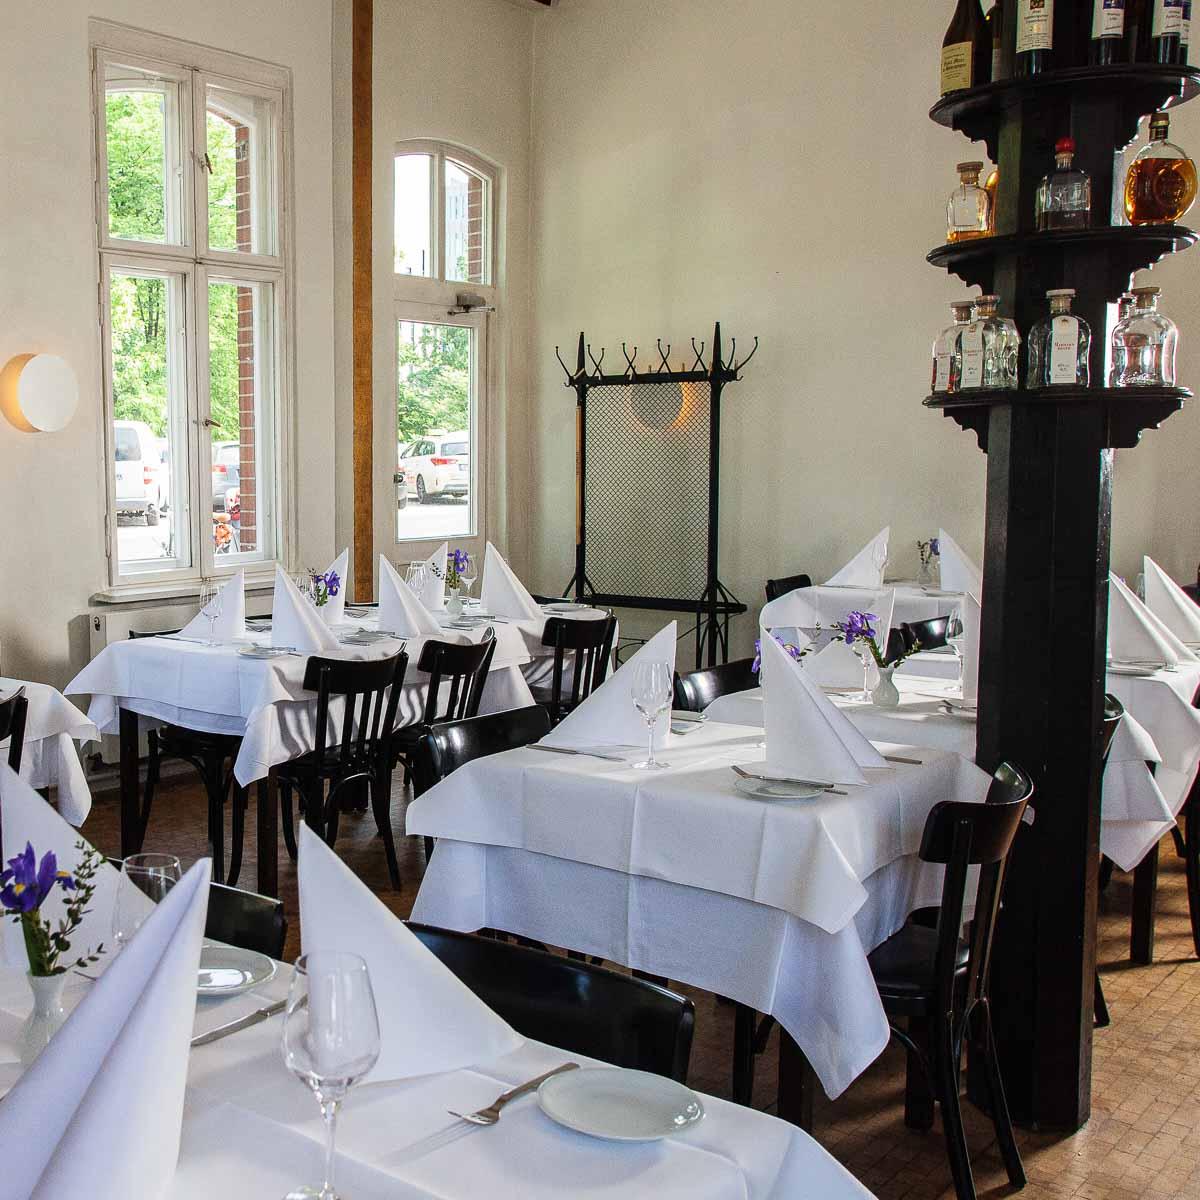 Restaurant Paris Moskau am Bundesinnenmisterium Berlin 3